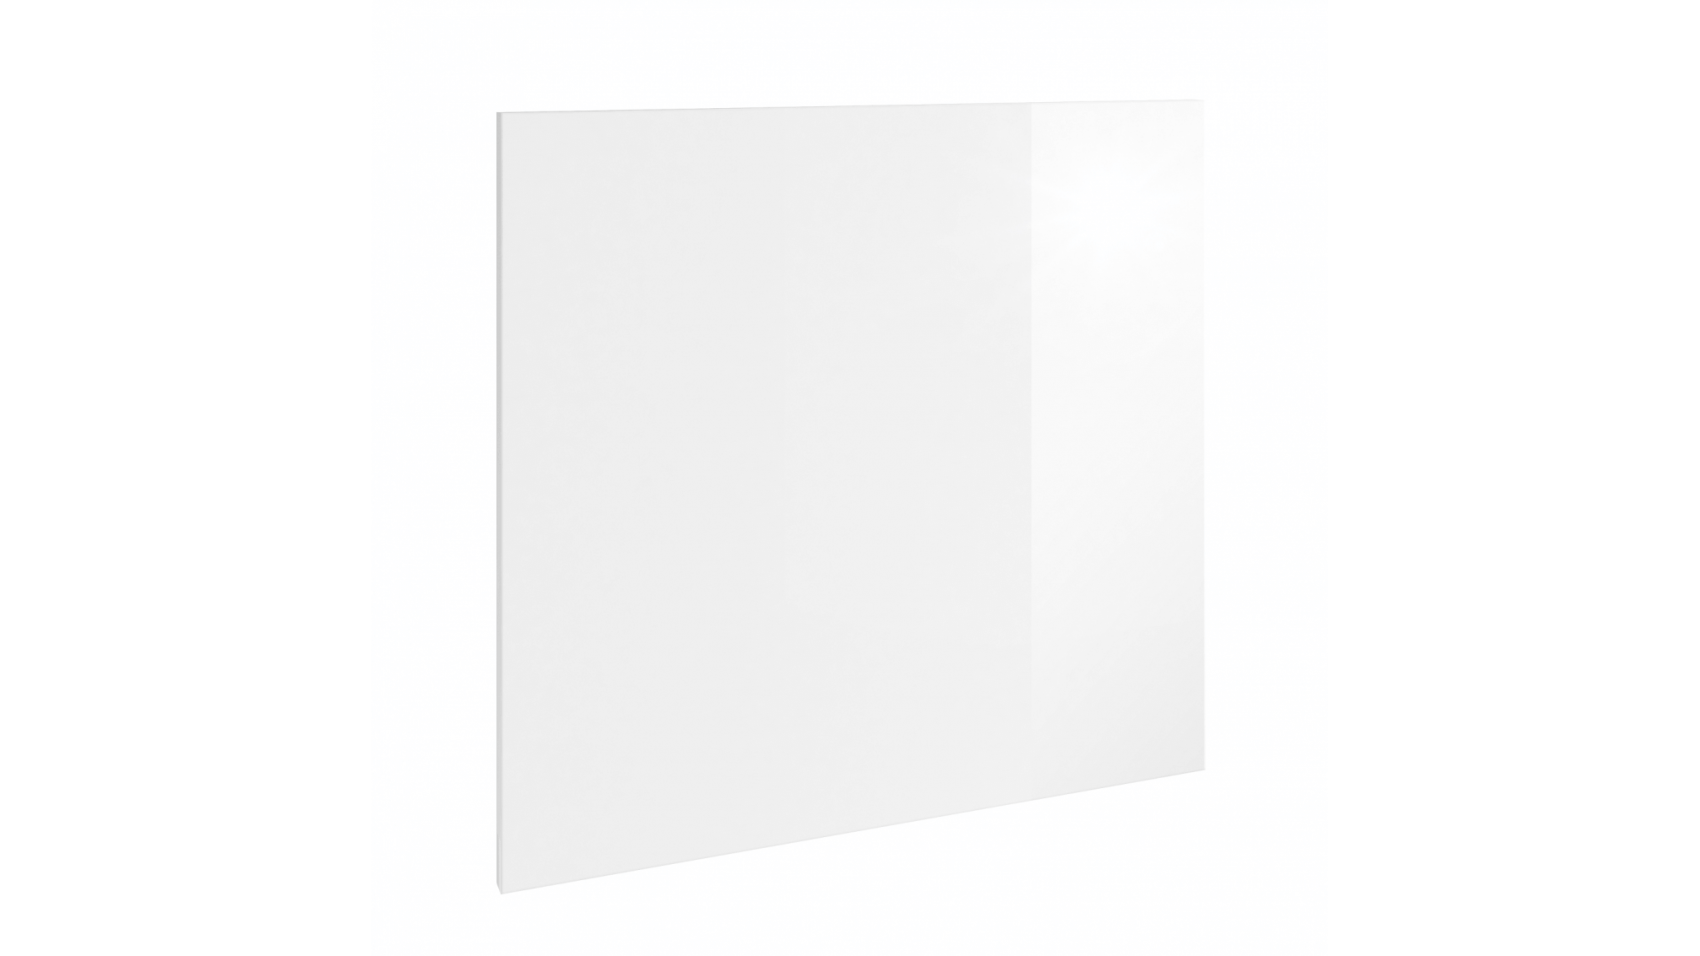 Kuchenne Elementy Dodatkowe Vegas White | sklep internetowy Lupus ECO